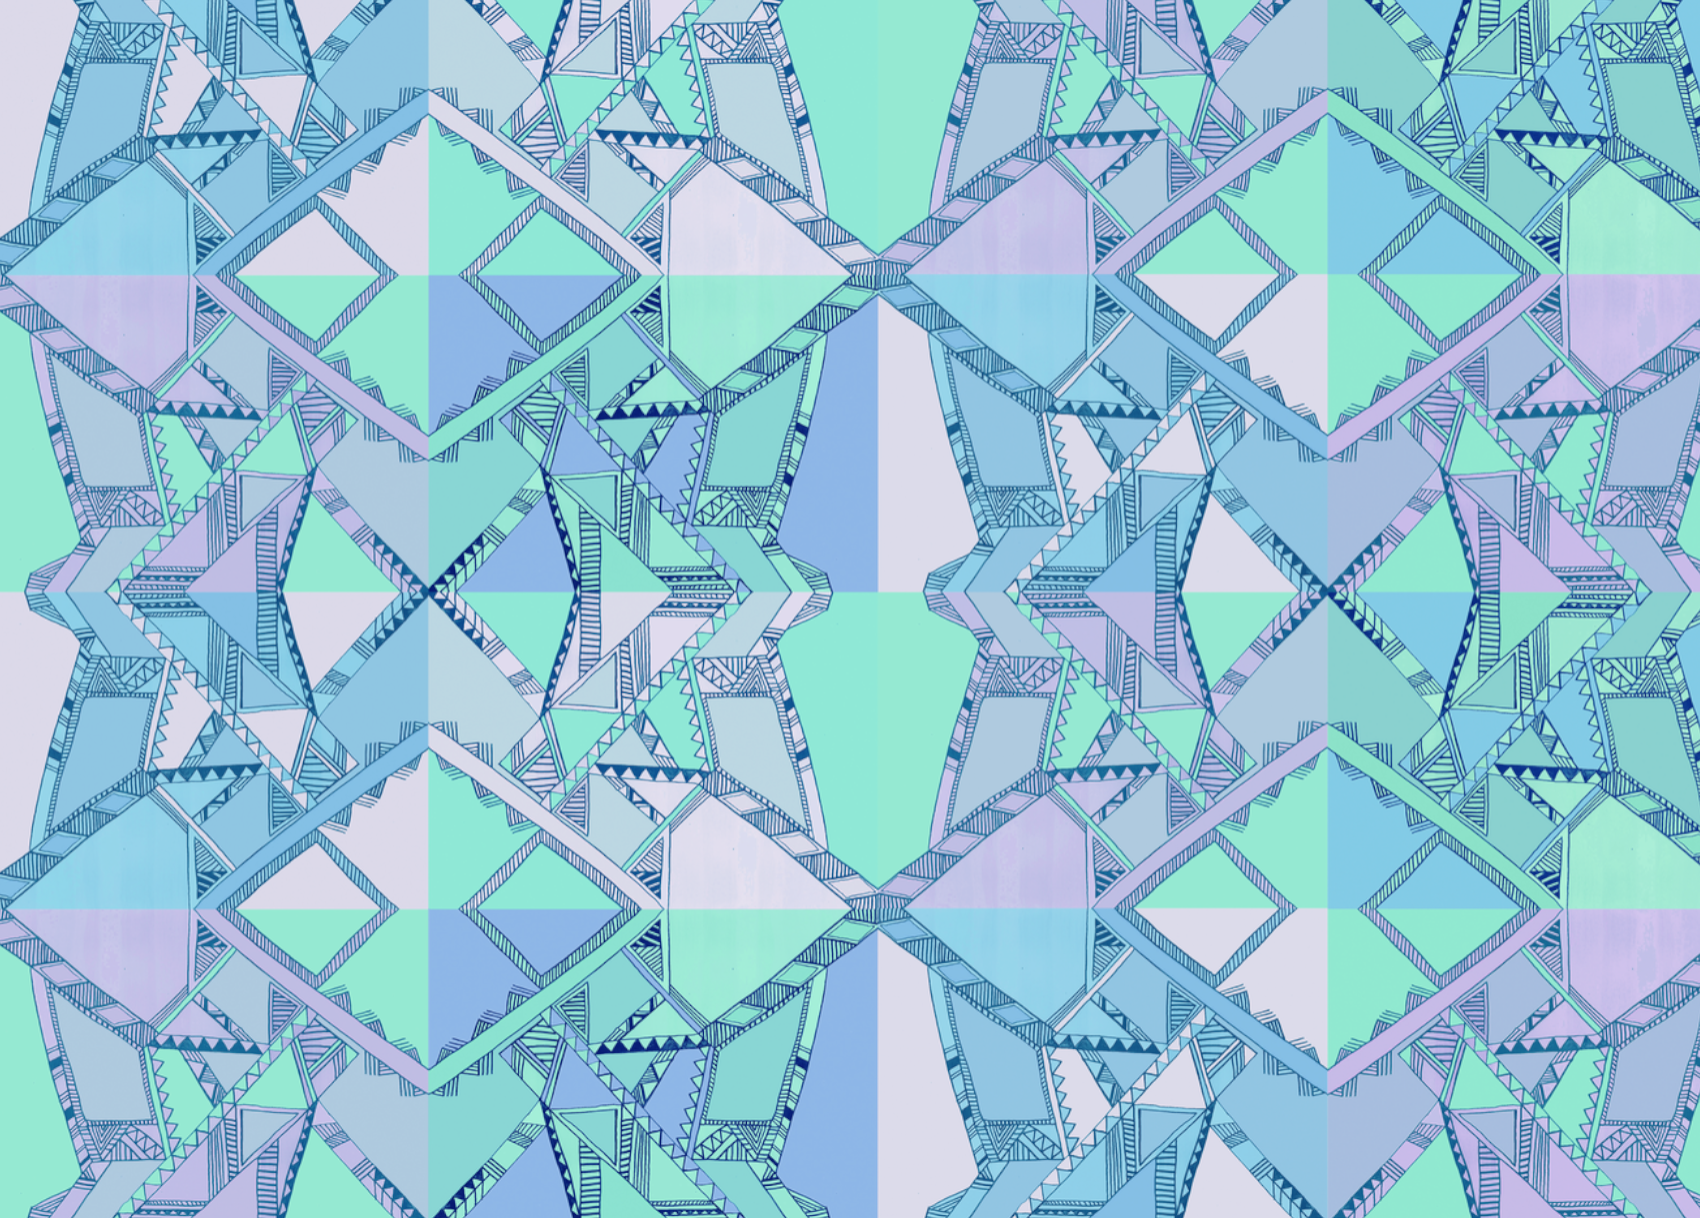 aztec pattern tumblr themes - photo #32